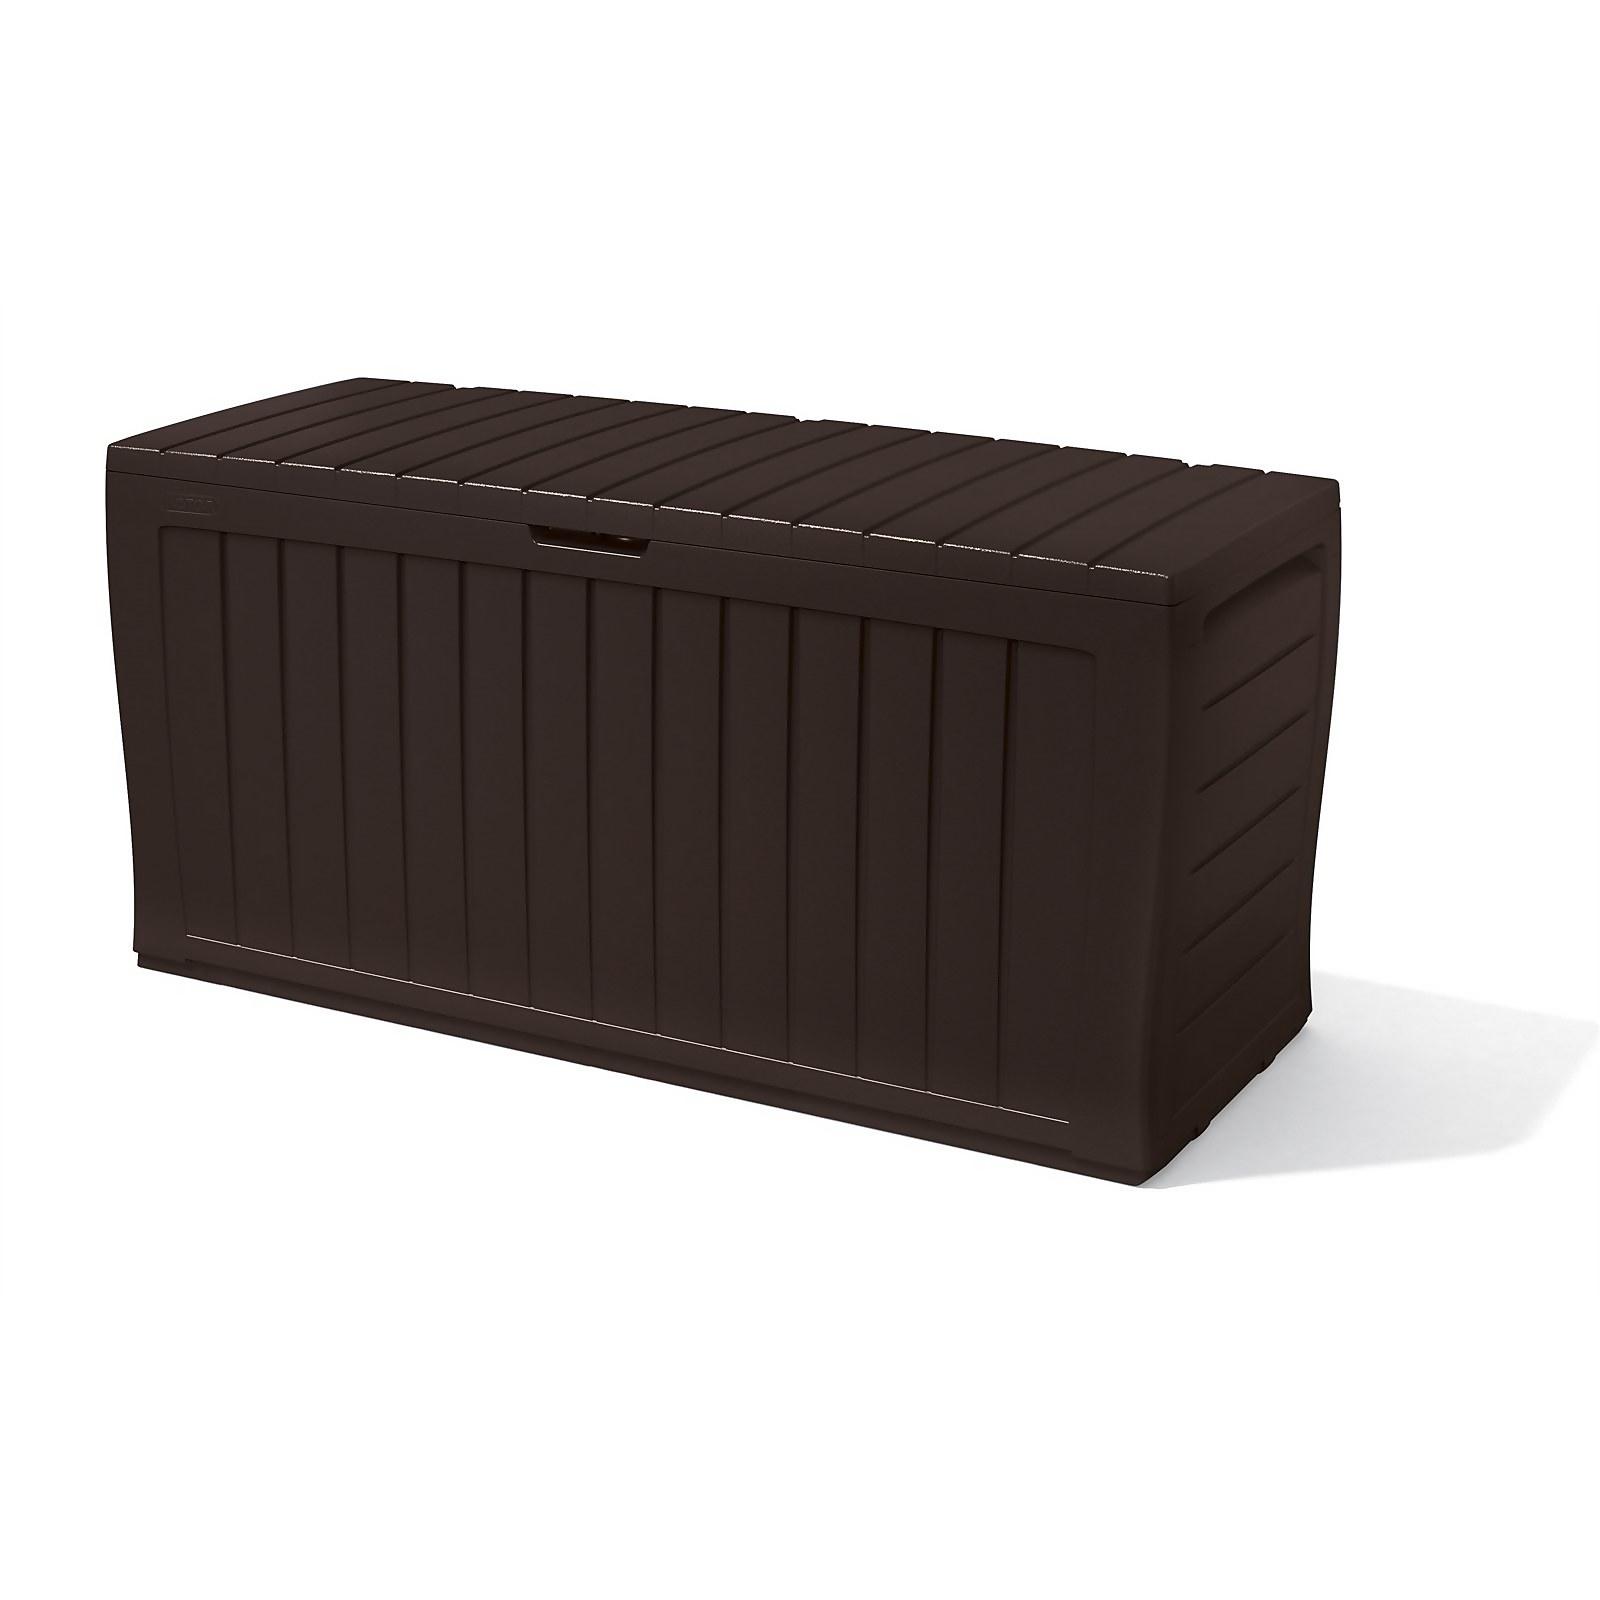 Keter Marvel Plus Outdoor Plastic Garden Storage Box 270L - Brown